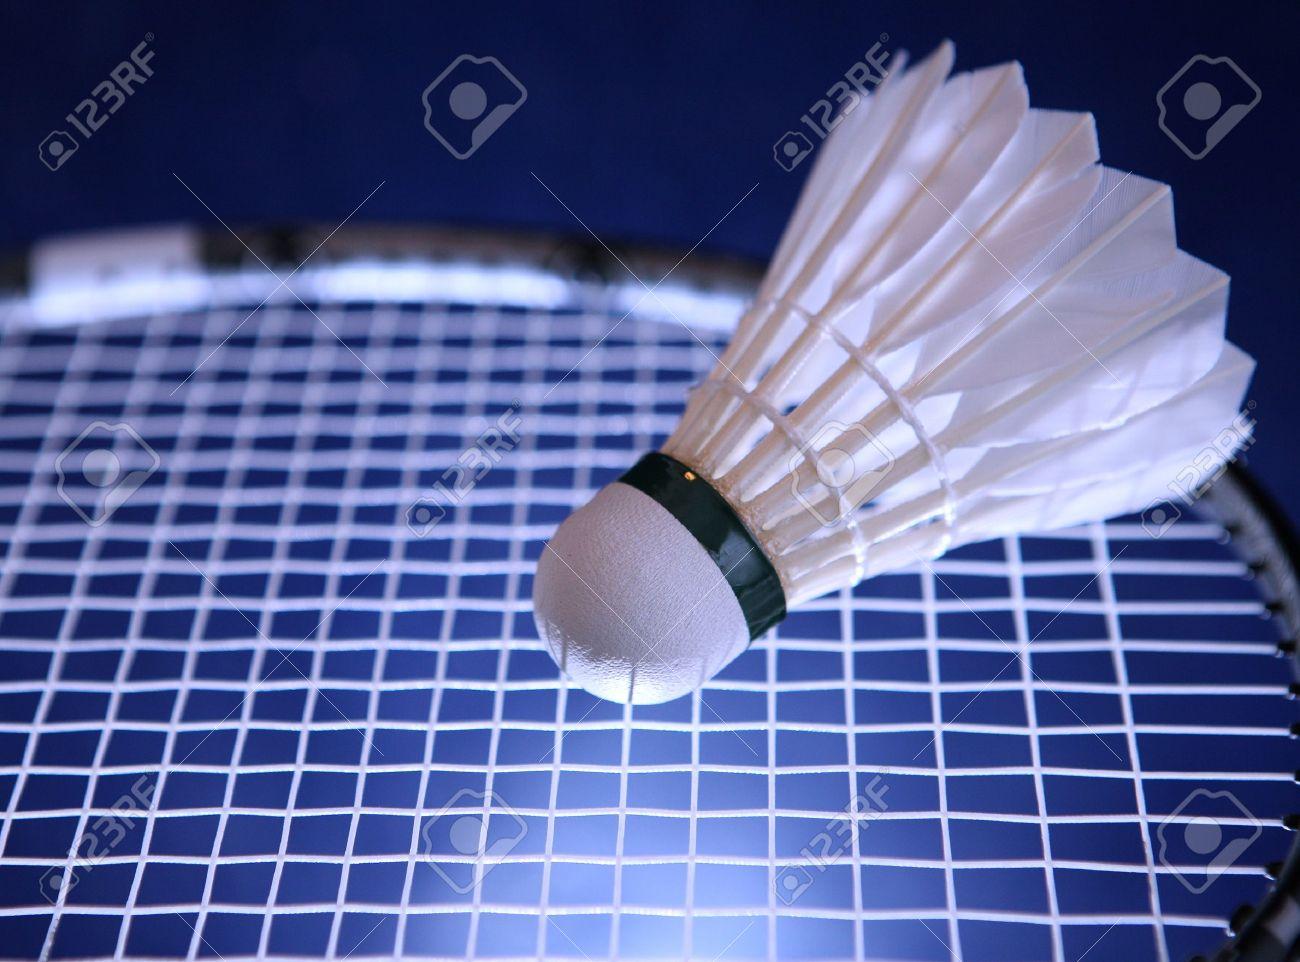 badminton report バドミントン活動報告(bar(badminton action report)) has 5,049 members バドミントン活動(バド活)楽しんでますか。 このグループを通じて、喜怒哀楽、様々な情報を共有し、皆さんでバドミントンを盛り上げていきましょう.